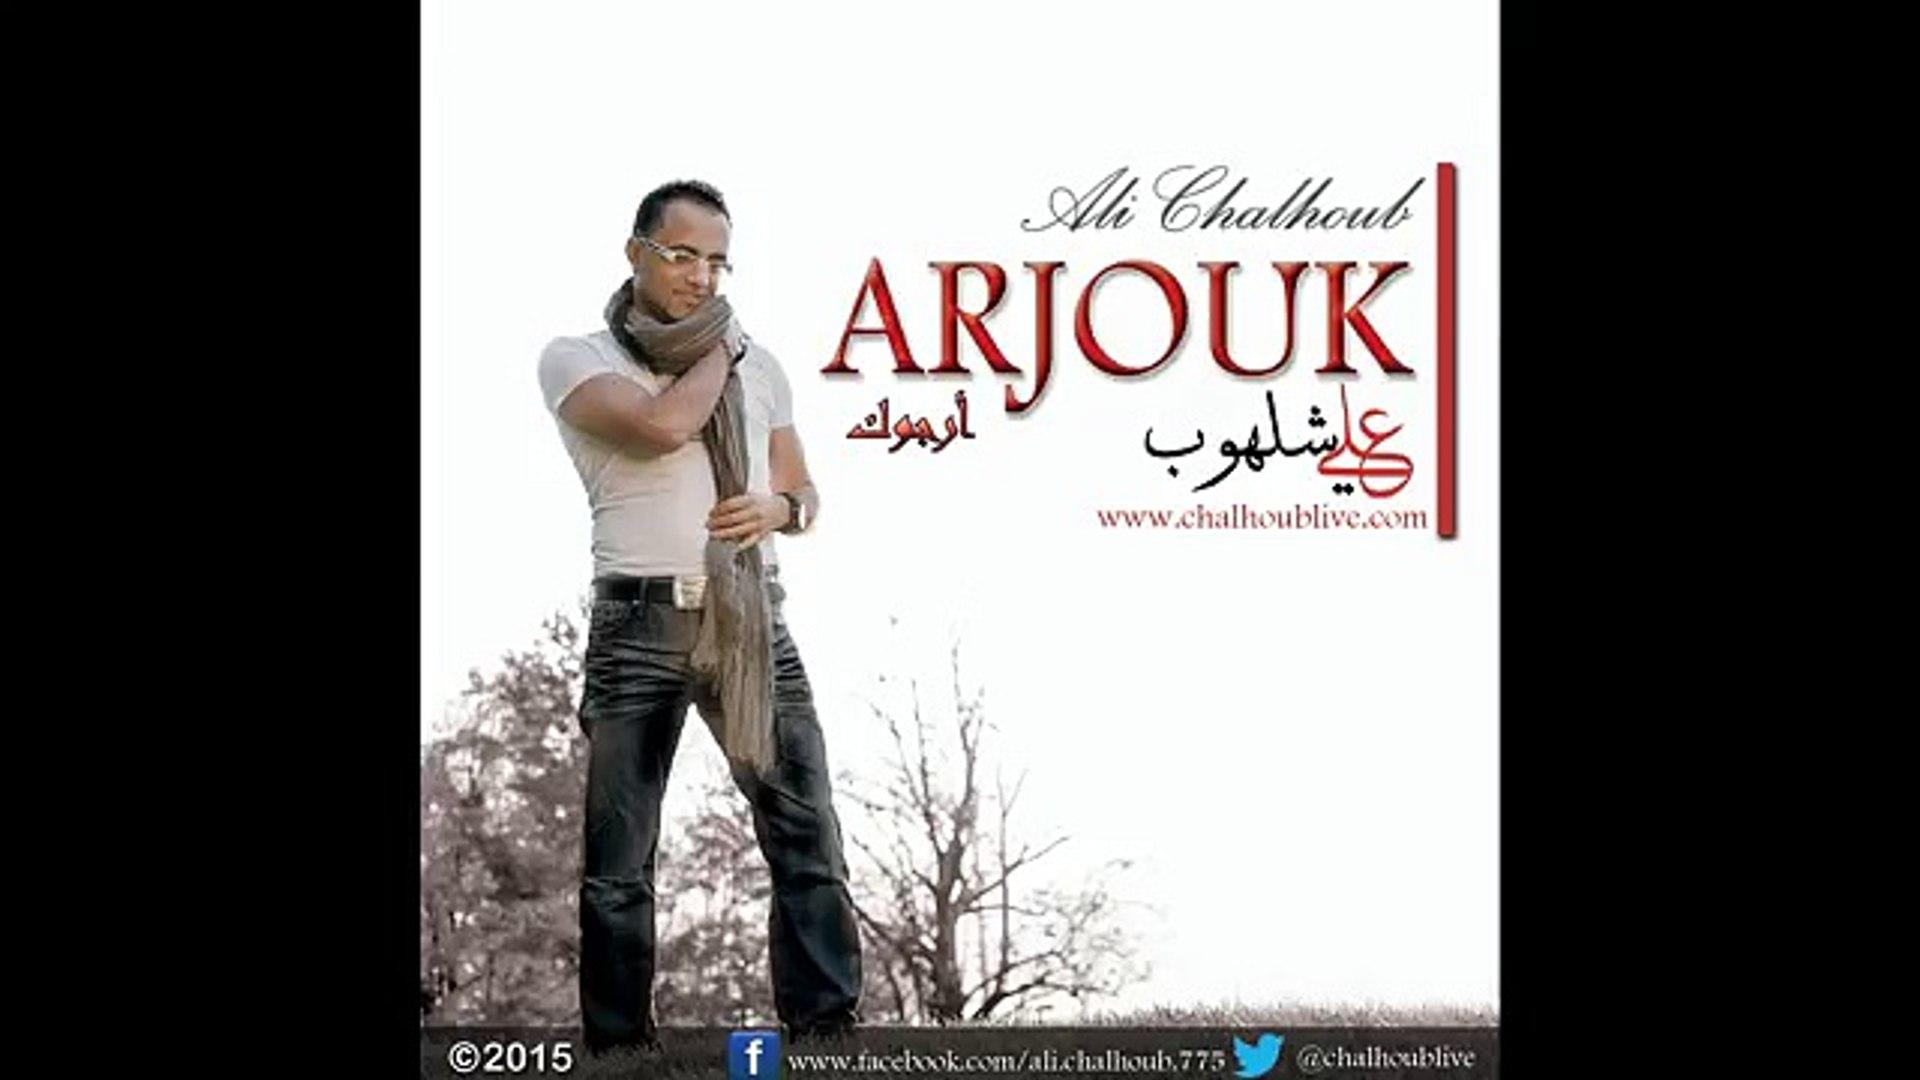 Arabic Music 2015 - Arabic Songs 2015 - Isma3 - Ali Chalhoub 2015 - اسمع - Ø